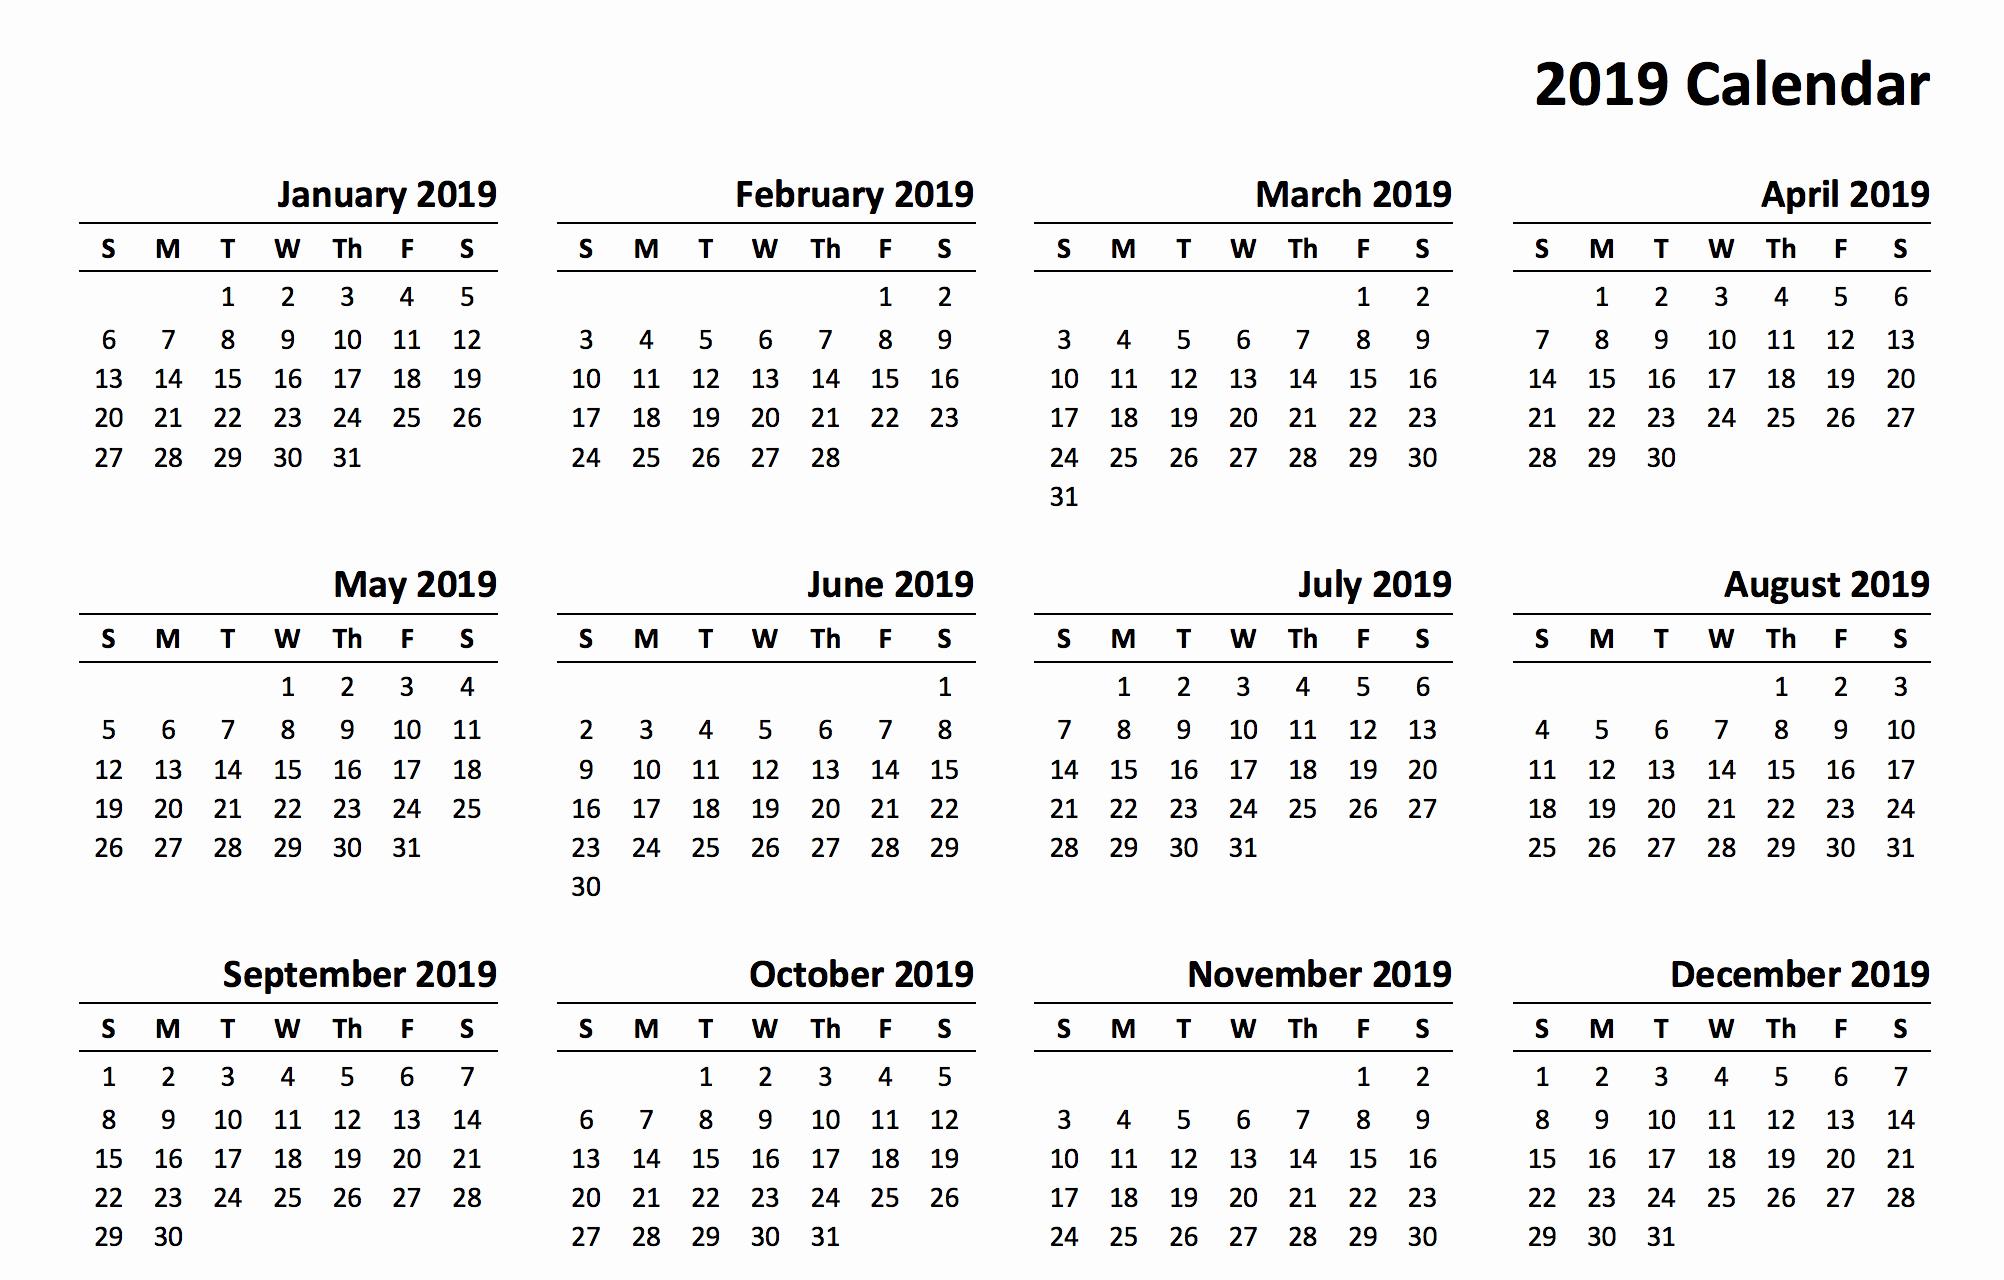 Free Printable Weekly Calendar 2019 Inspirational 2019 Calendar Amazonaws